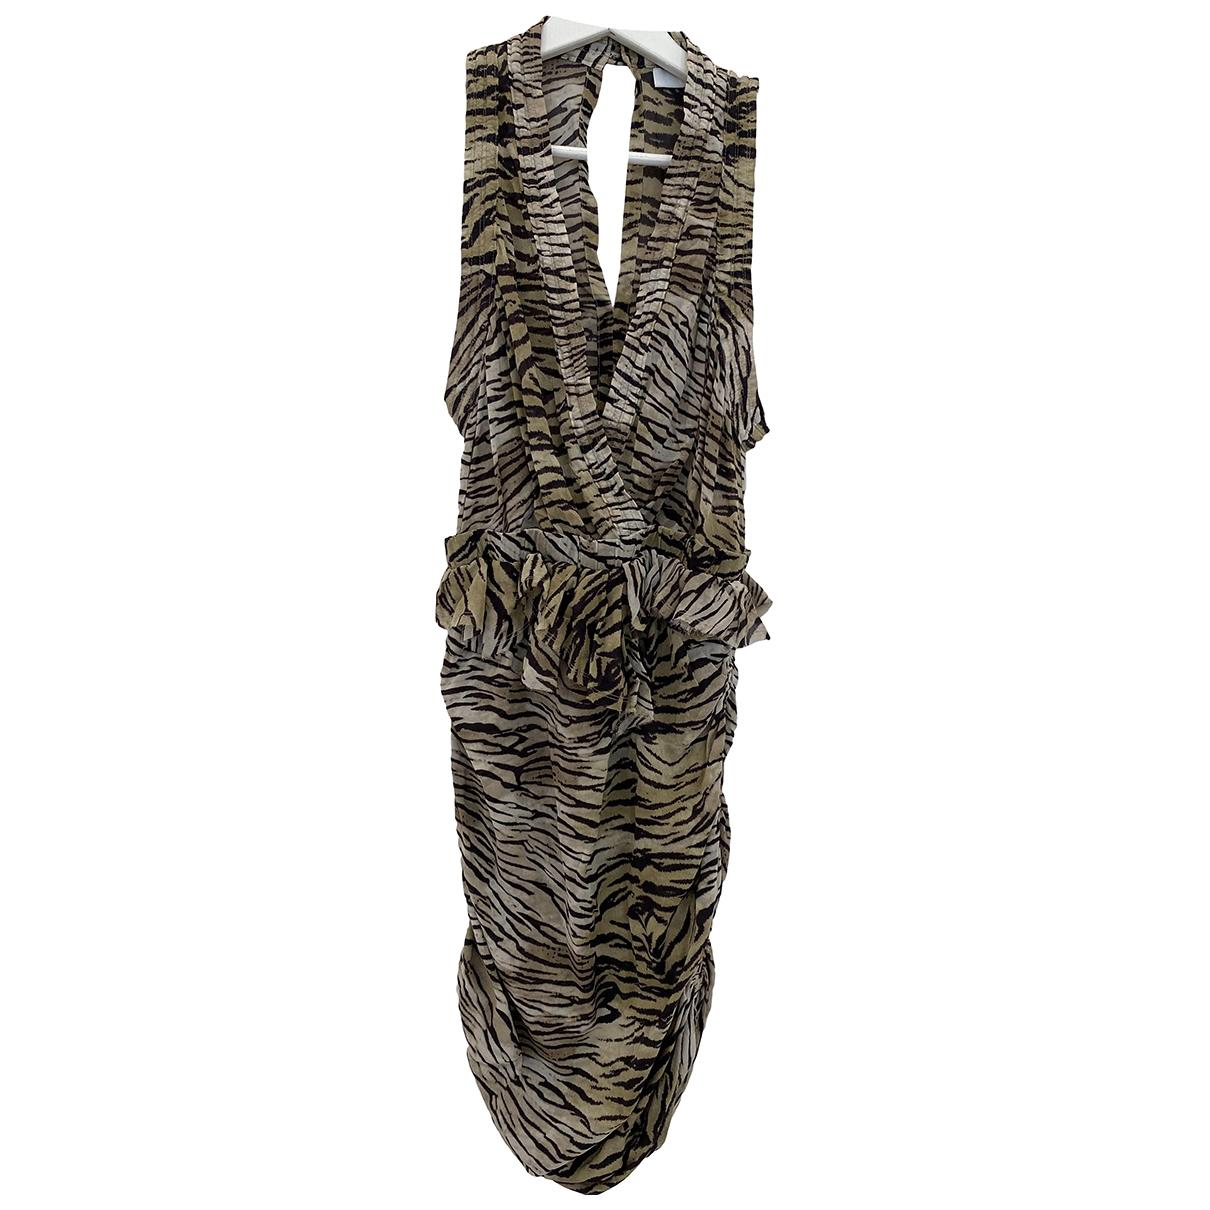 Iro - Robe Fall Winter 2019 pour femme en soie